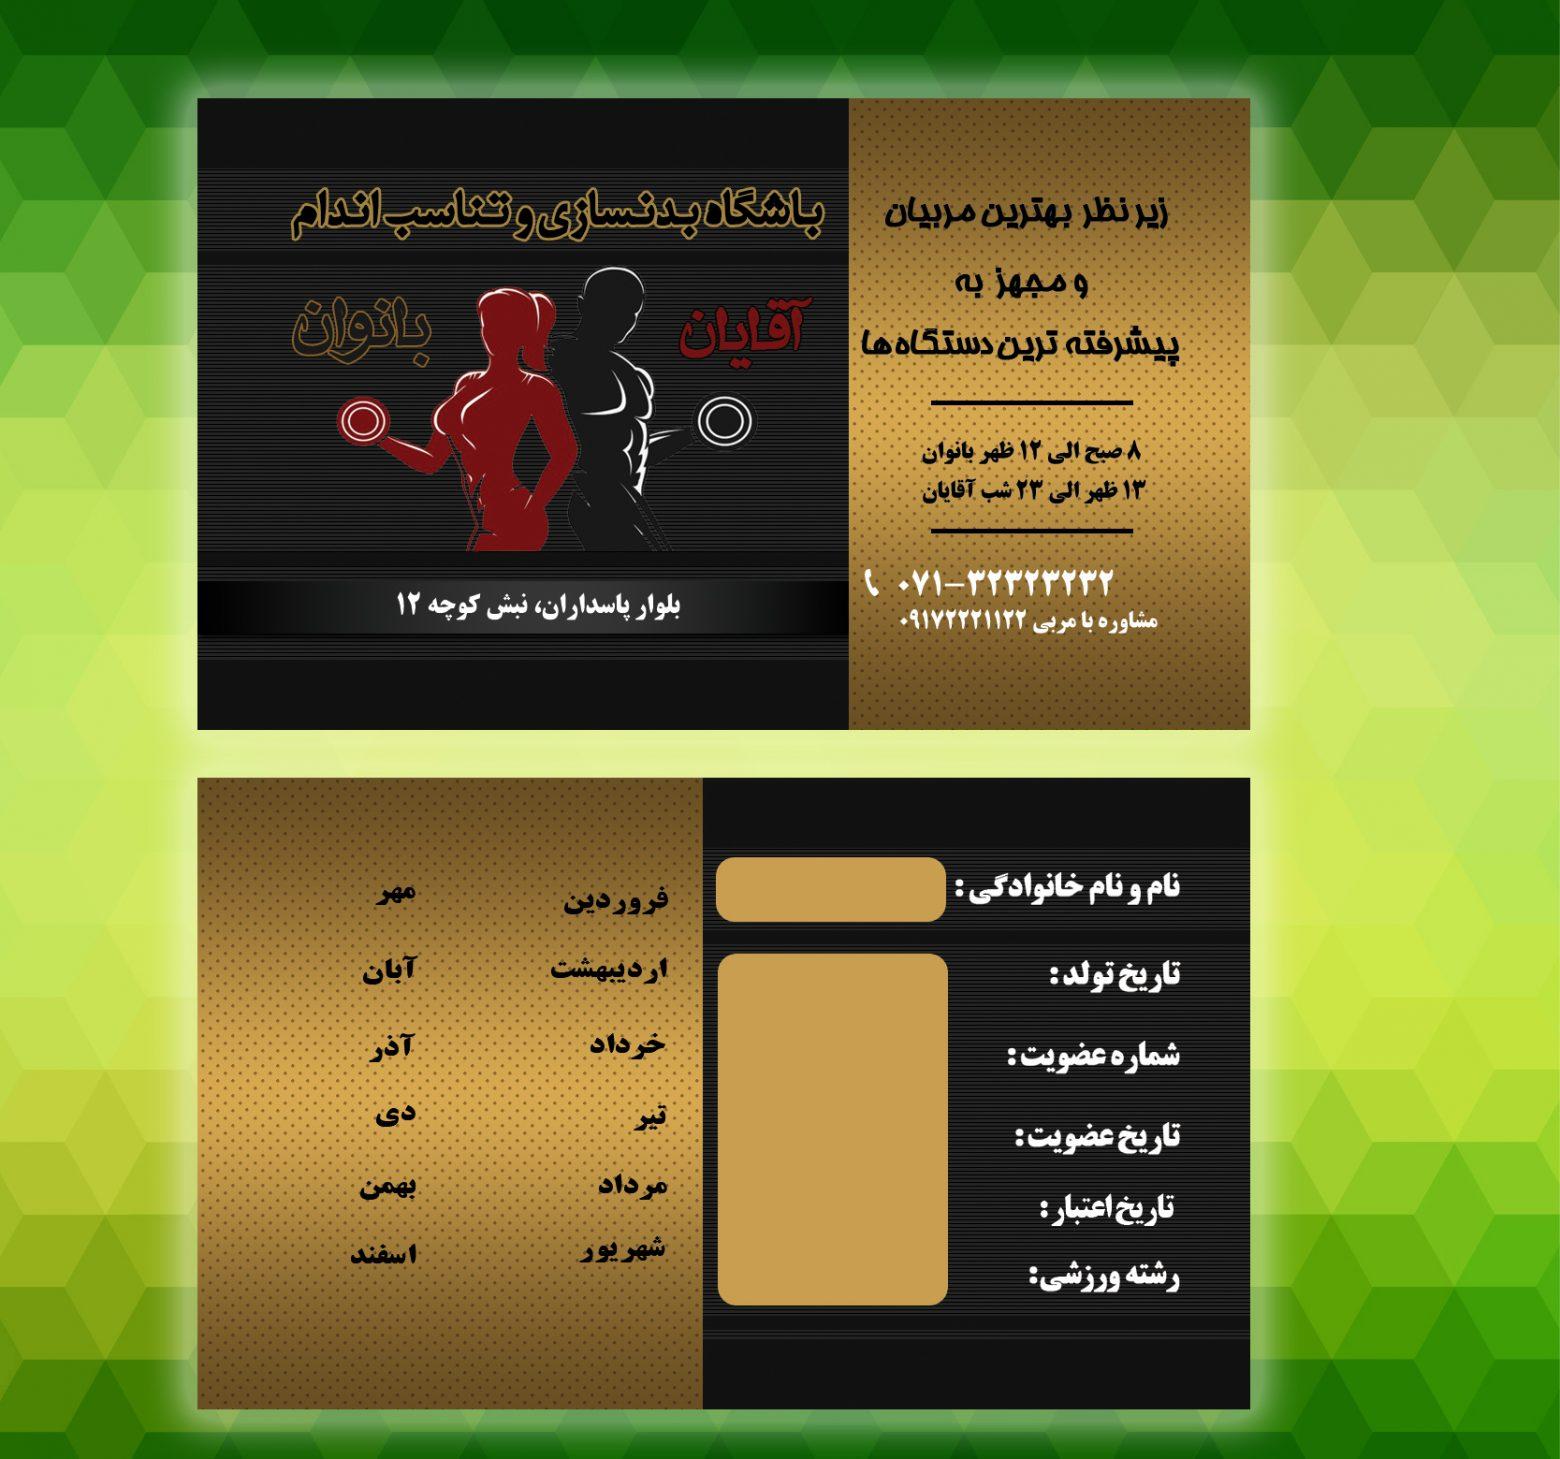 green1 pentazoom.ir  1560x1459 - کارت ویزیت و عضویت باشگاه بدنسازی و تناسب اندام